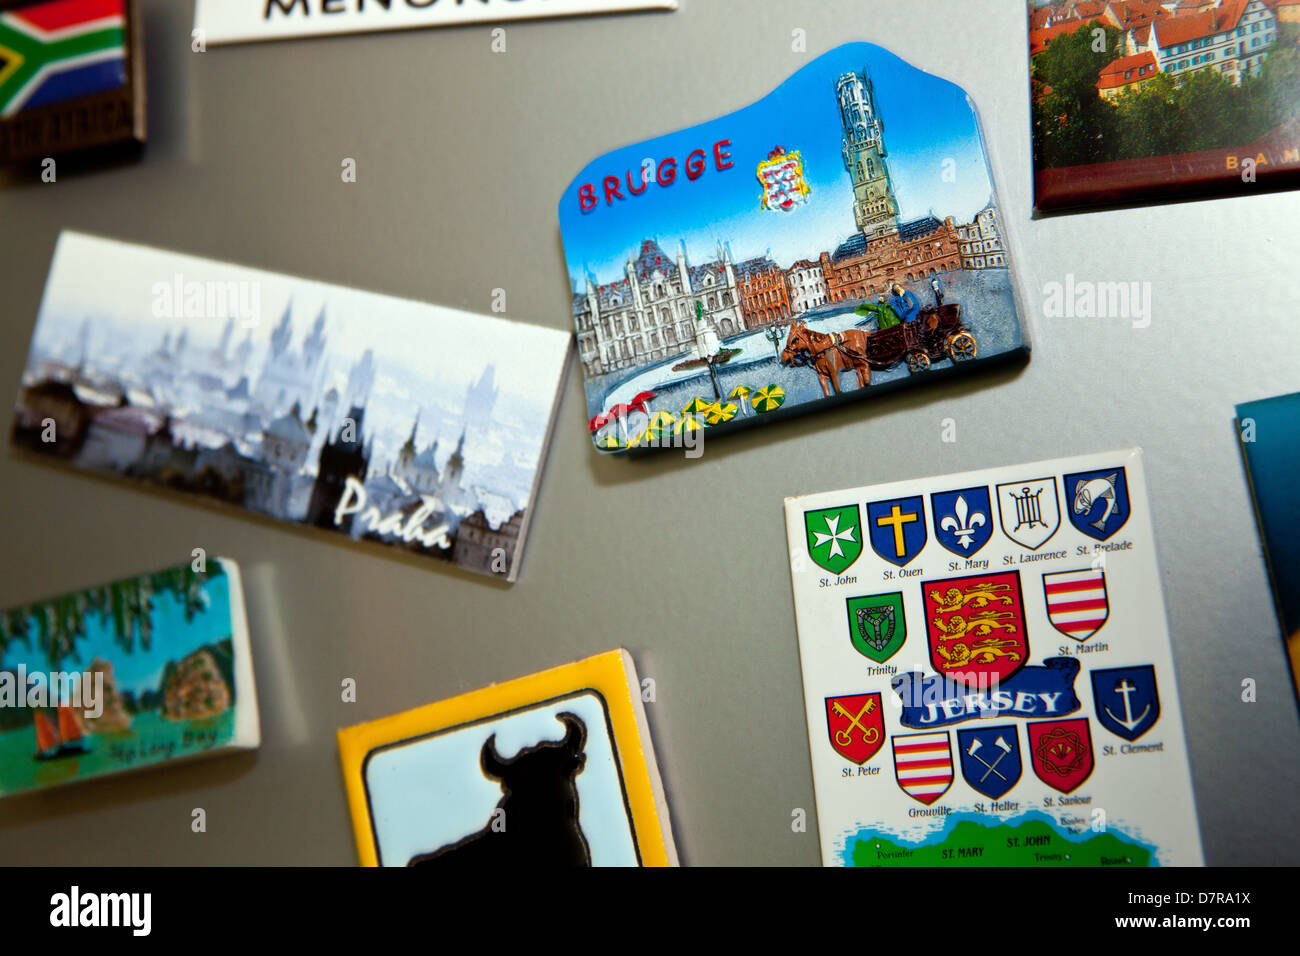 Kühlschrank Magnete : Reise kühlschrank magnete stockfoto bild: 56446486 alamy